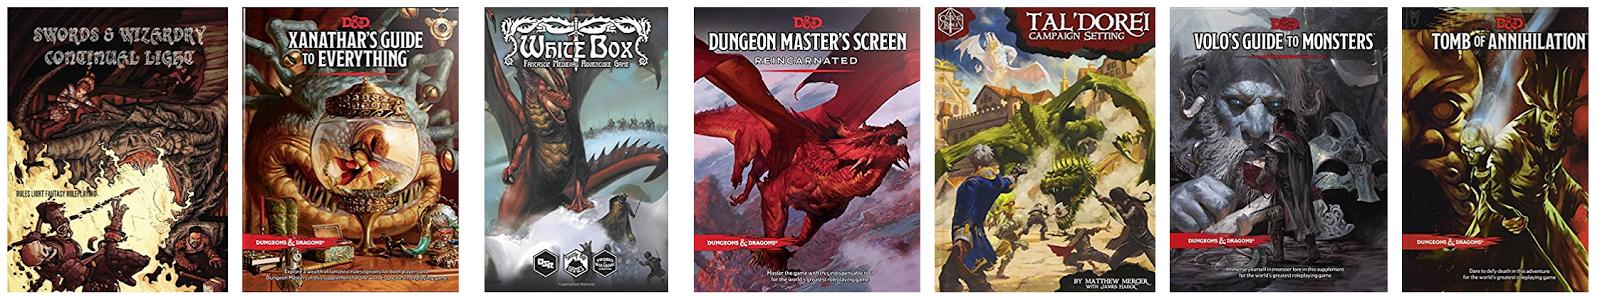 Tenkar's Tavern: Amazon - $5 off $20 in Books - Stock up on Swords